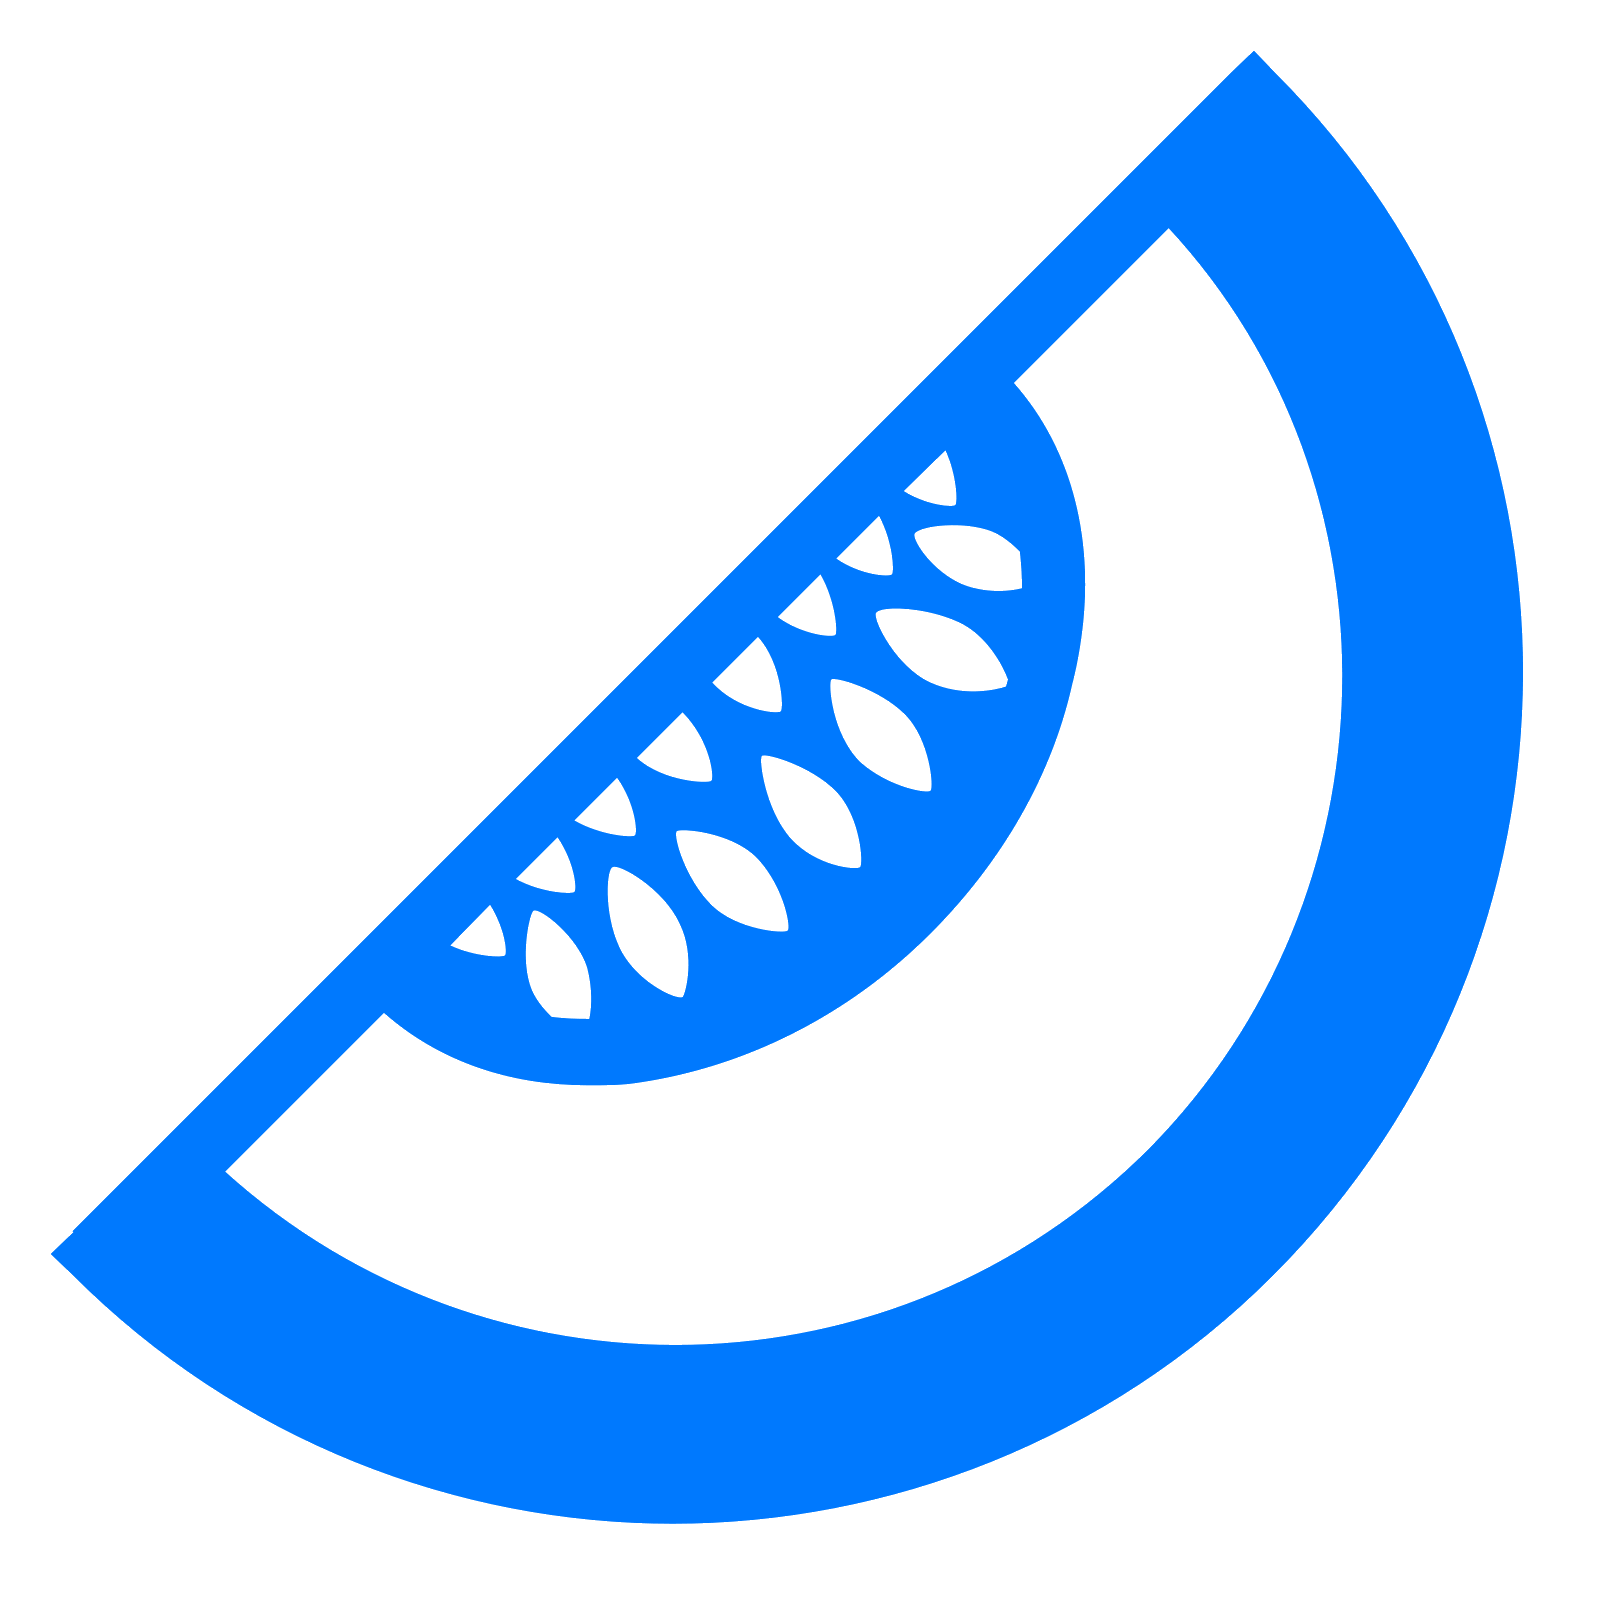 Computer icons clip art. Watermelon clipart muskmelon